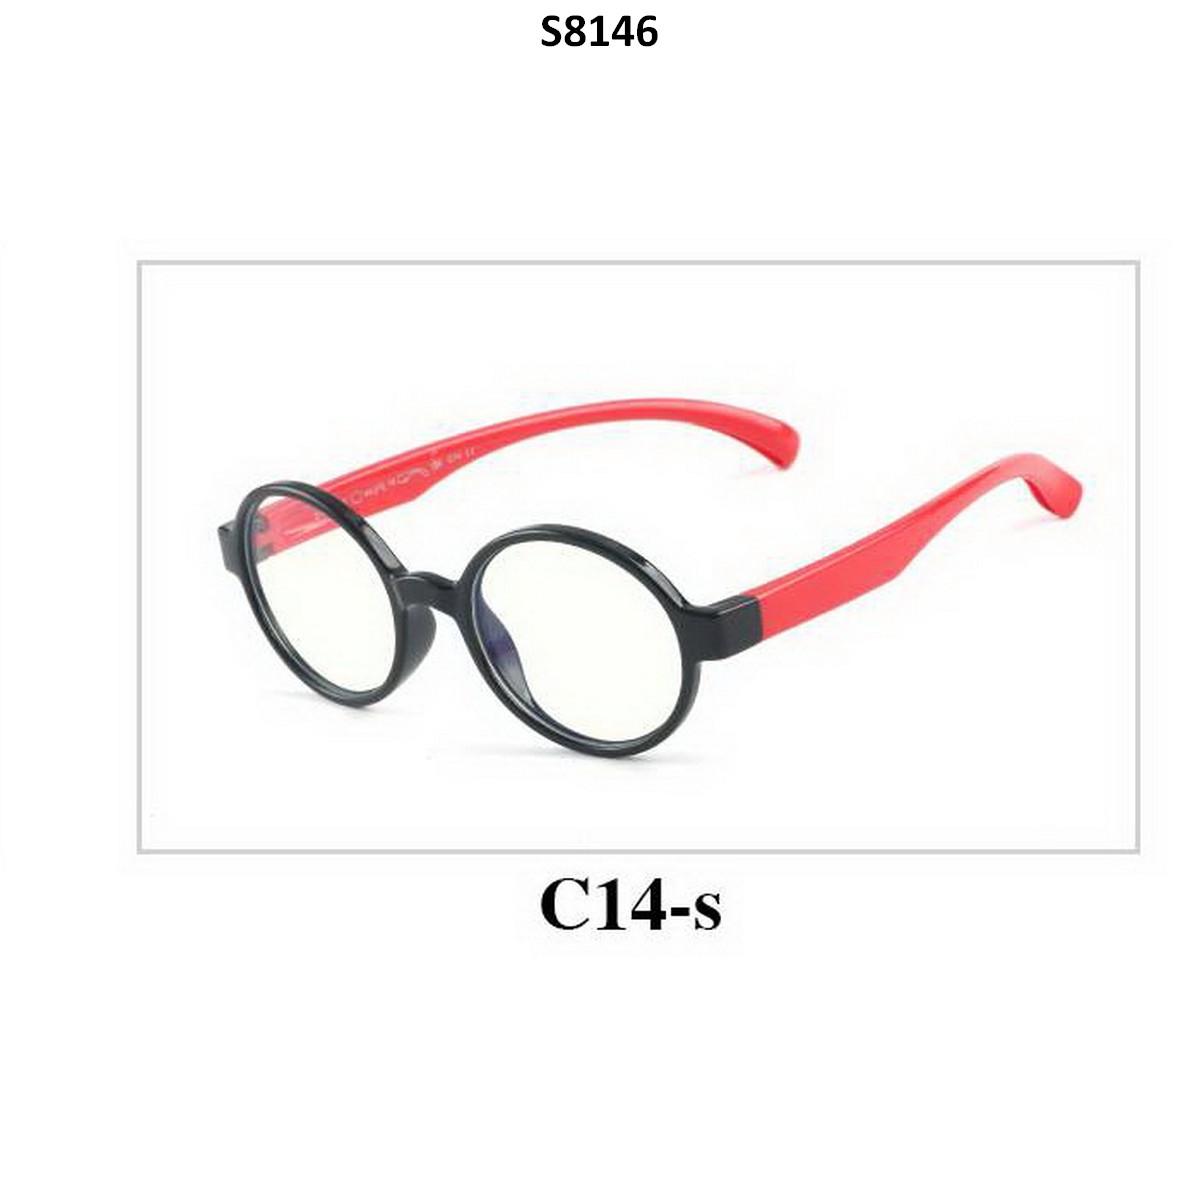 Kids Blue Light Blocker Computer Glasses Anti Blue Ray Eyeglasses S8146C14